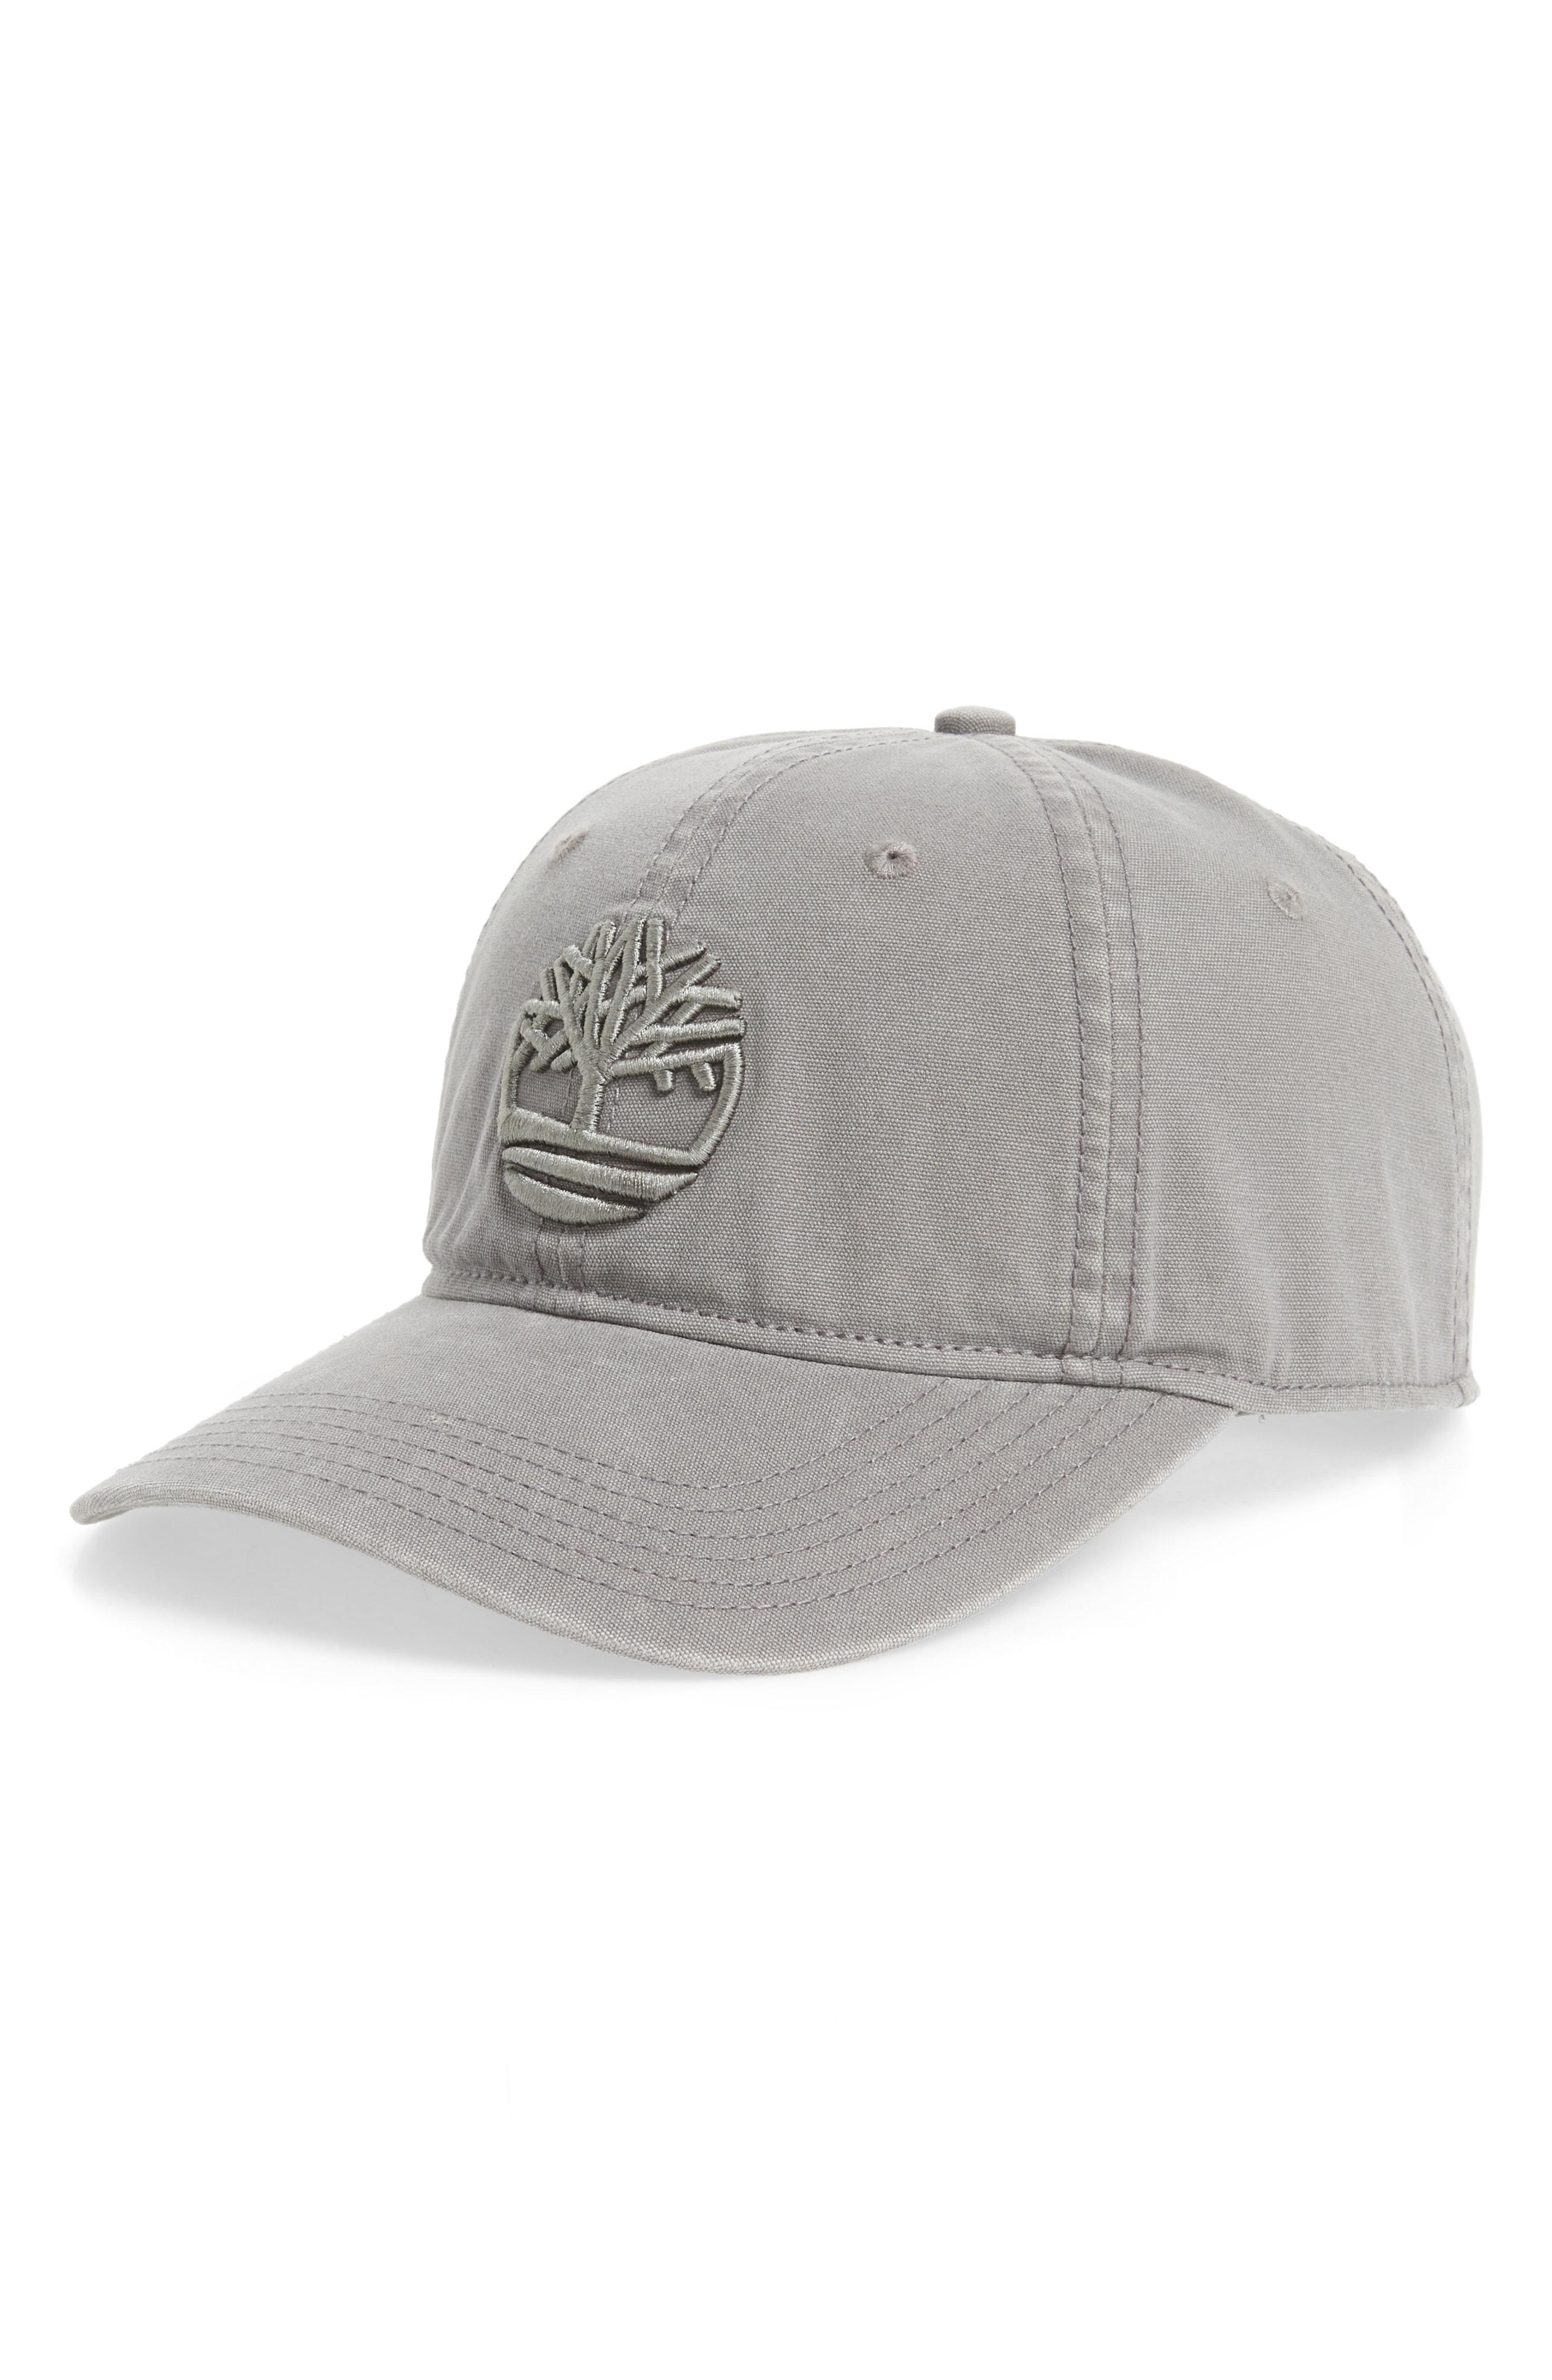 3206c45735b Lyst - Timberland Soundview Baseball Cap in Gray for Men